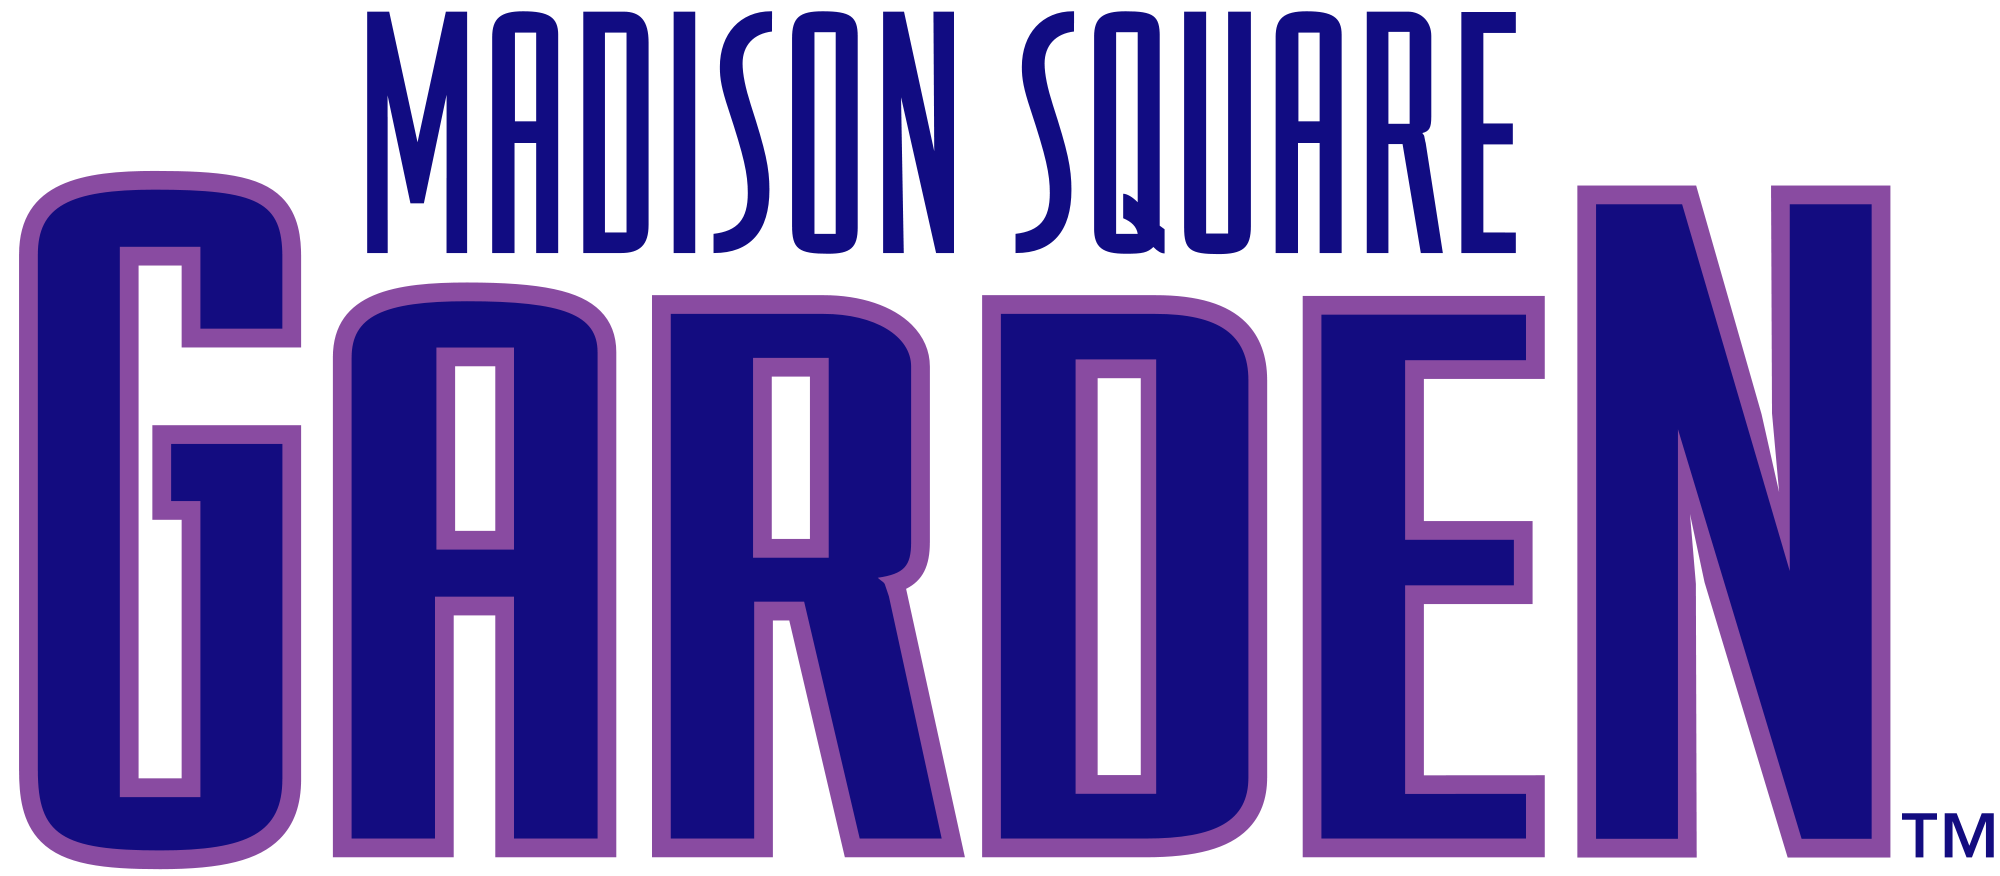 Udreamitdoit madison square garden s sales intern a blue hen intern s snapshot the ud blog for Madison square garden employment